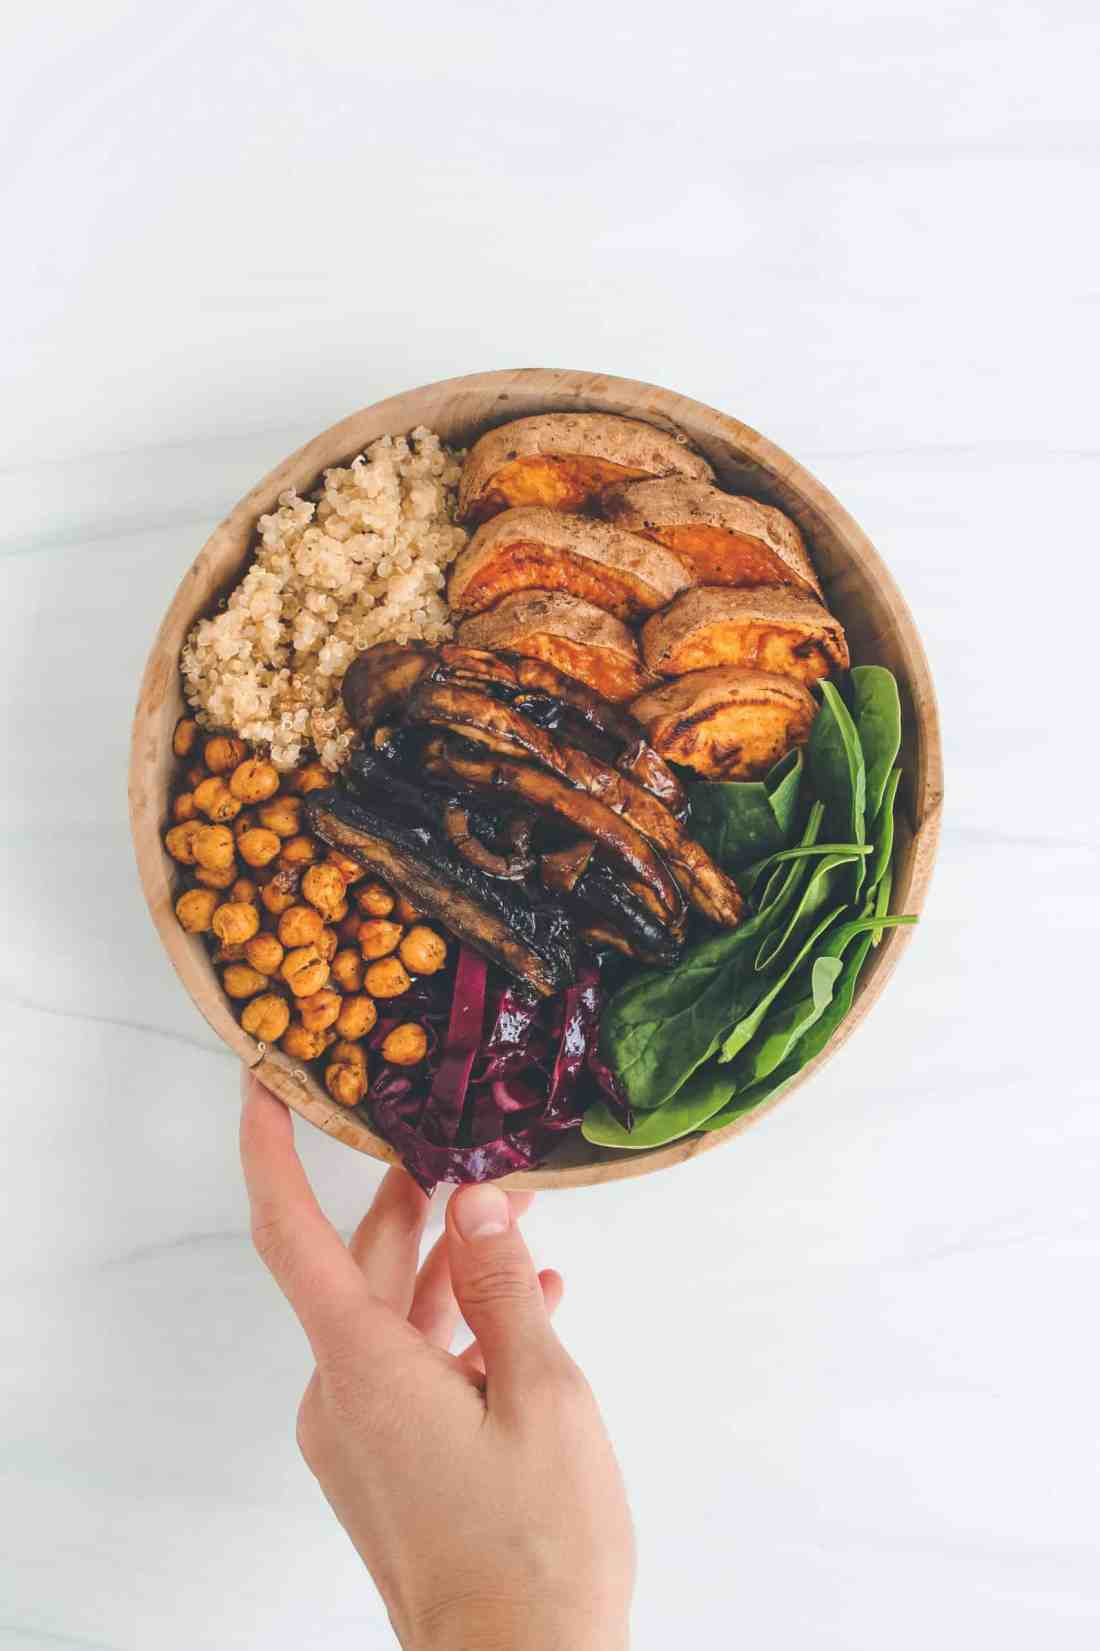 BBQ Portobello Mushroom Quinoa Bowl - Gluten Free & Vegan